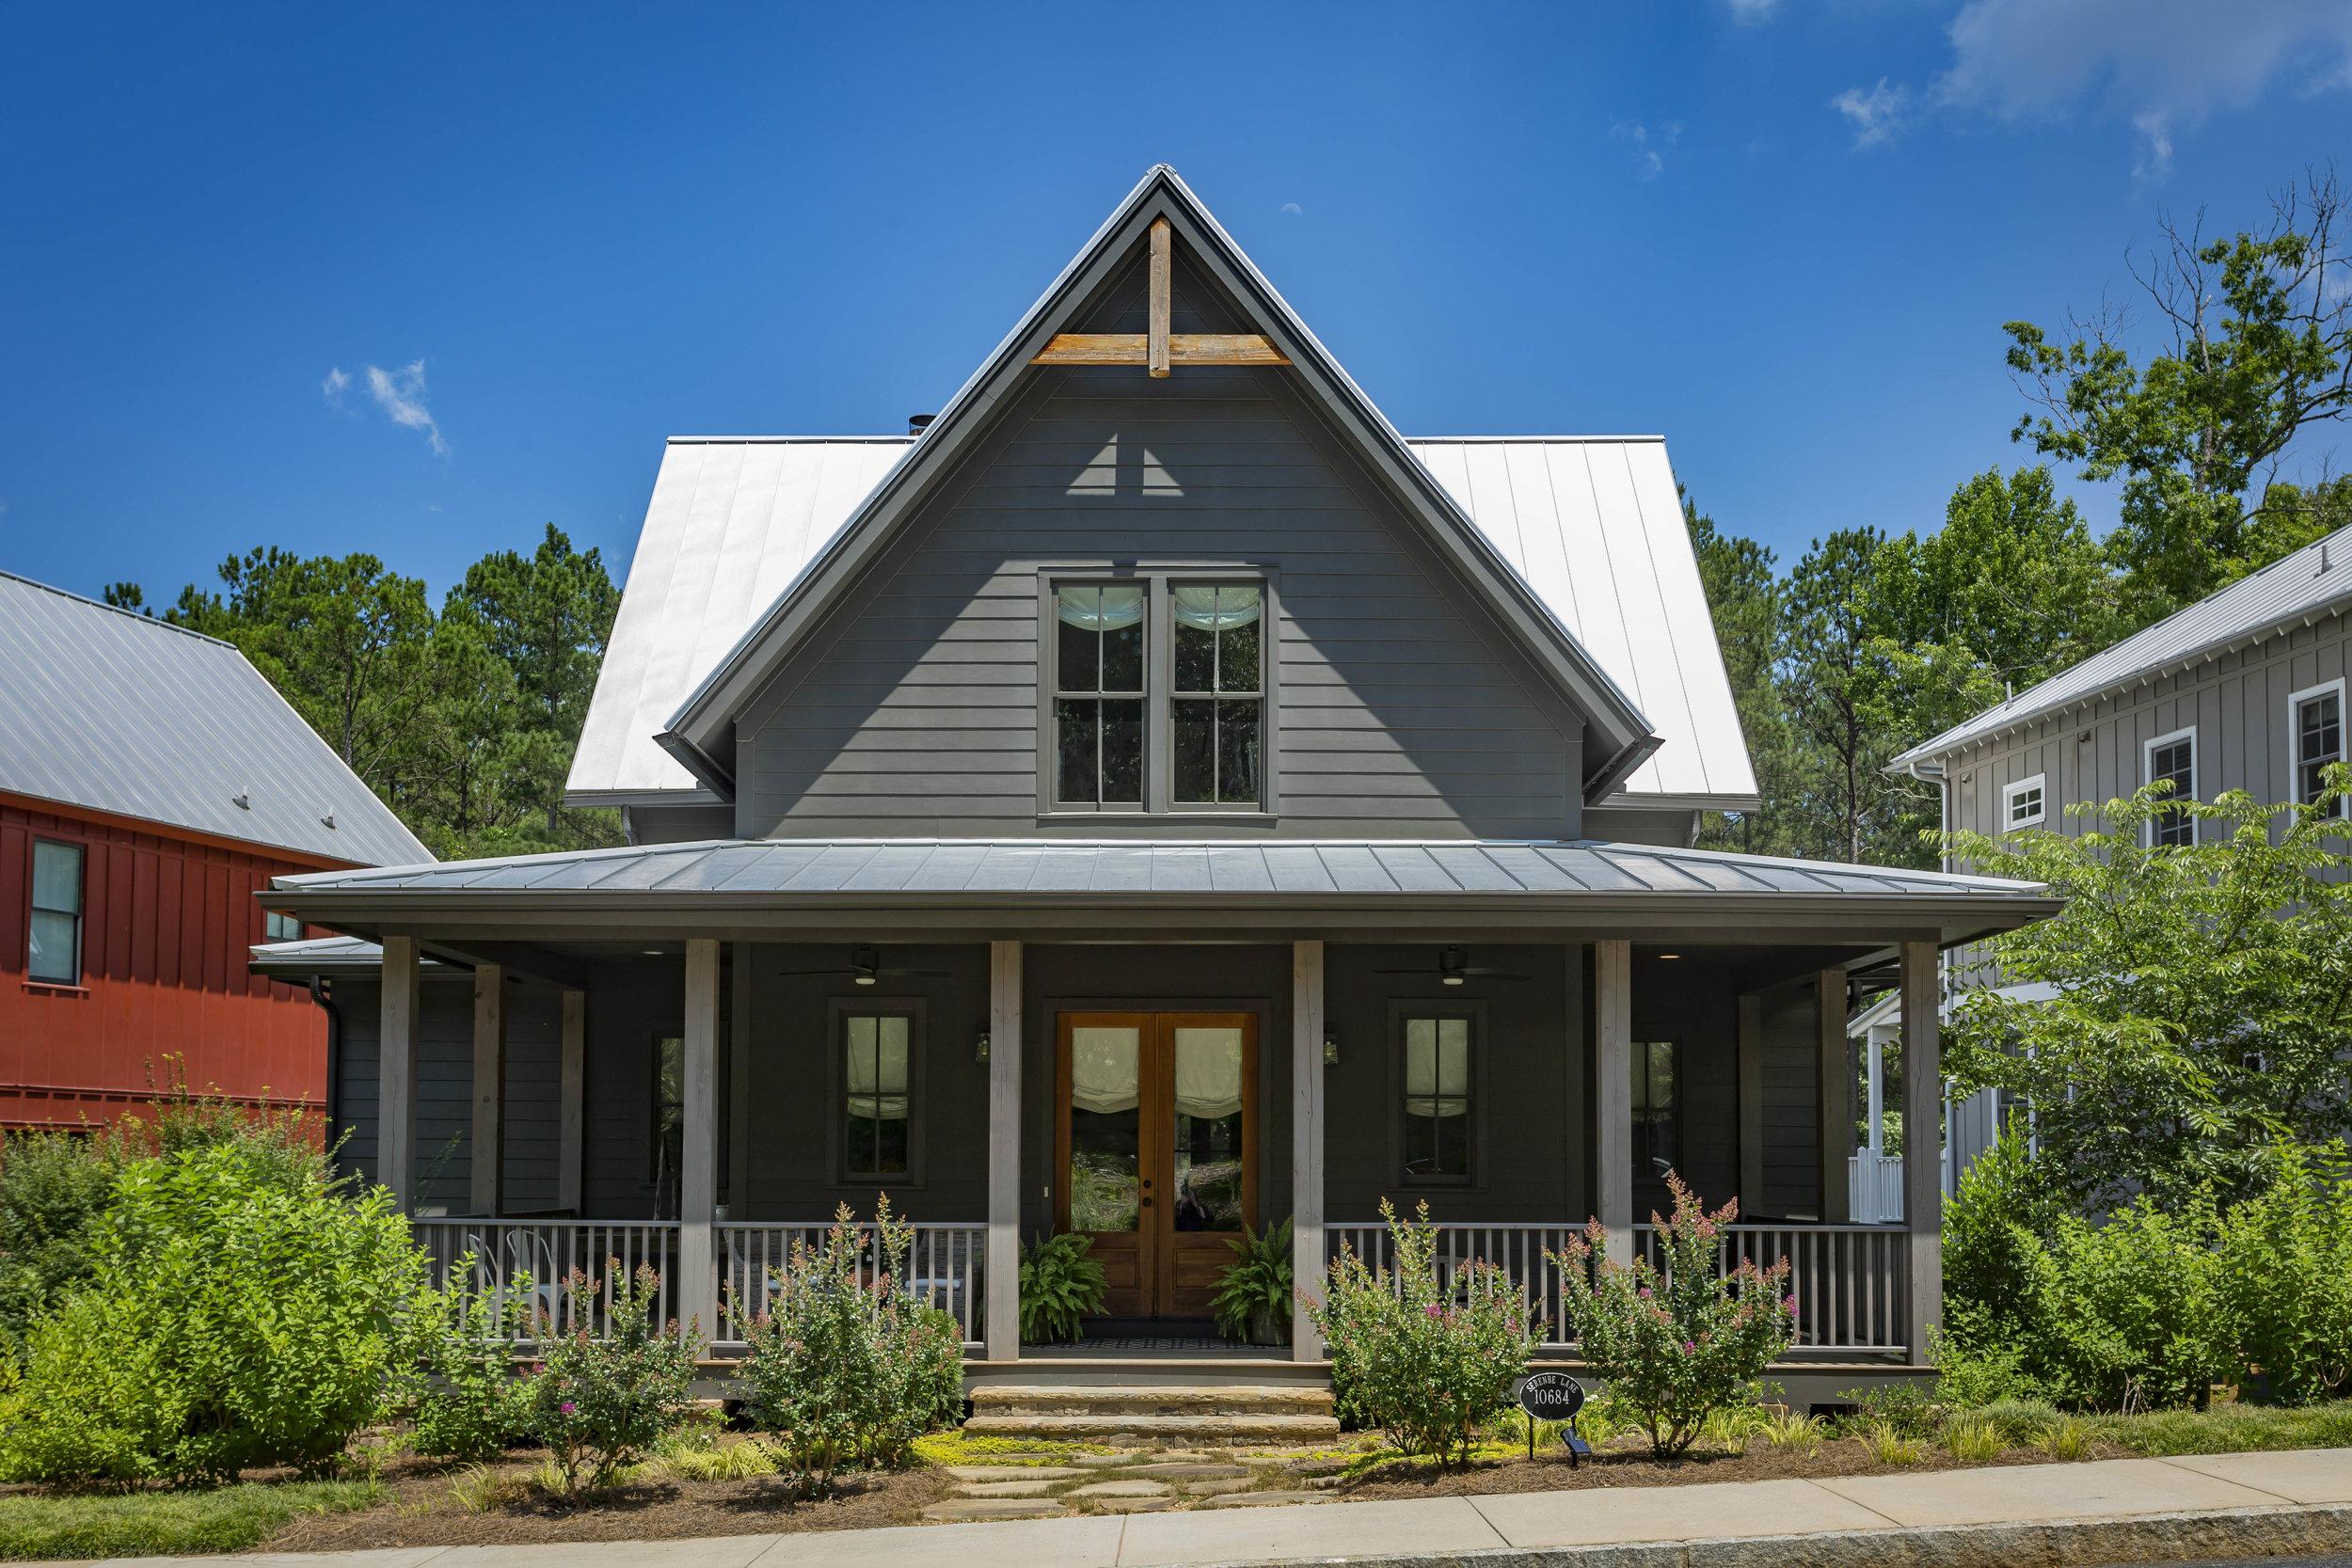 Gothic Farmhouse     5 Beds 4.5 baths 3,968 SQFT    Serenbe Community    Chattahoochee Hills, GA